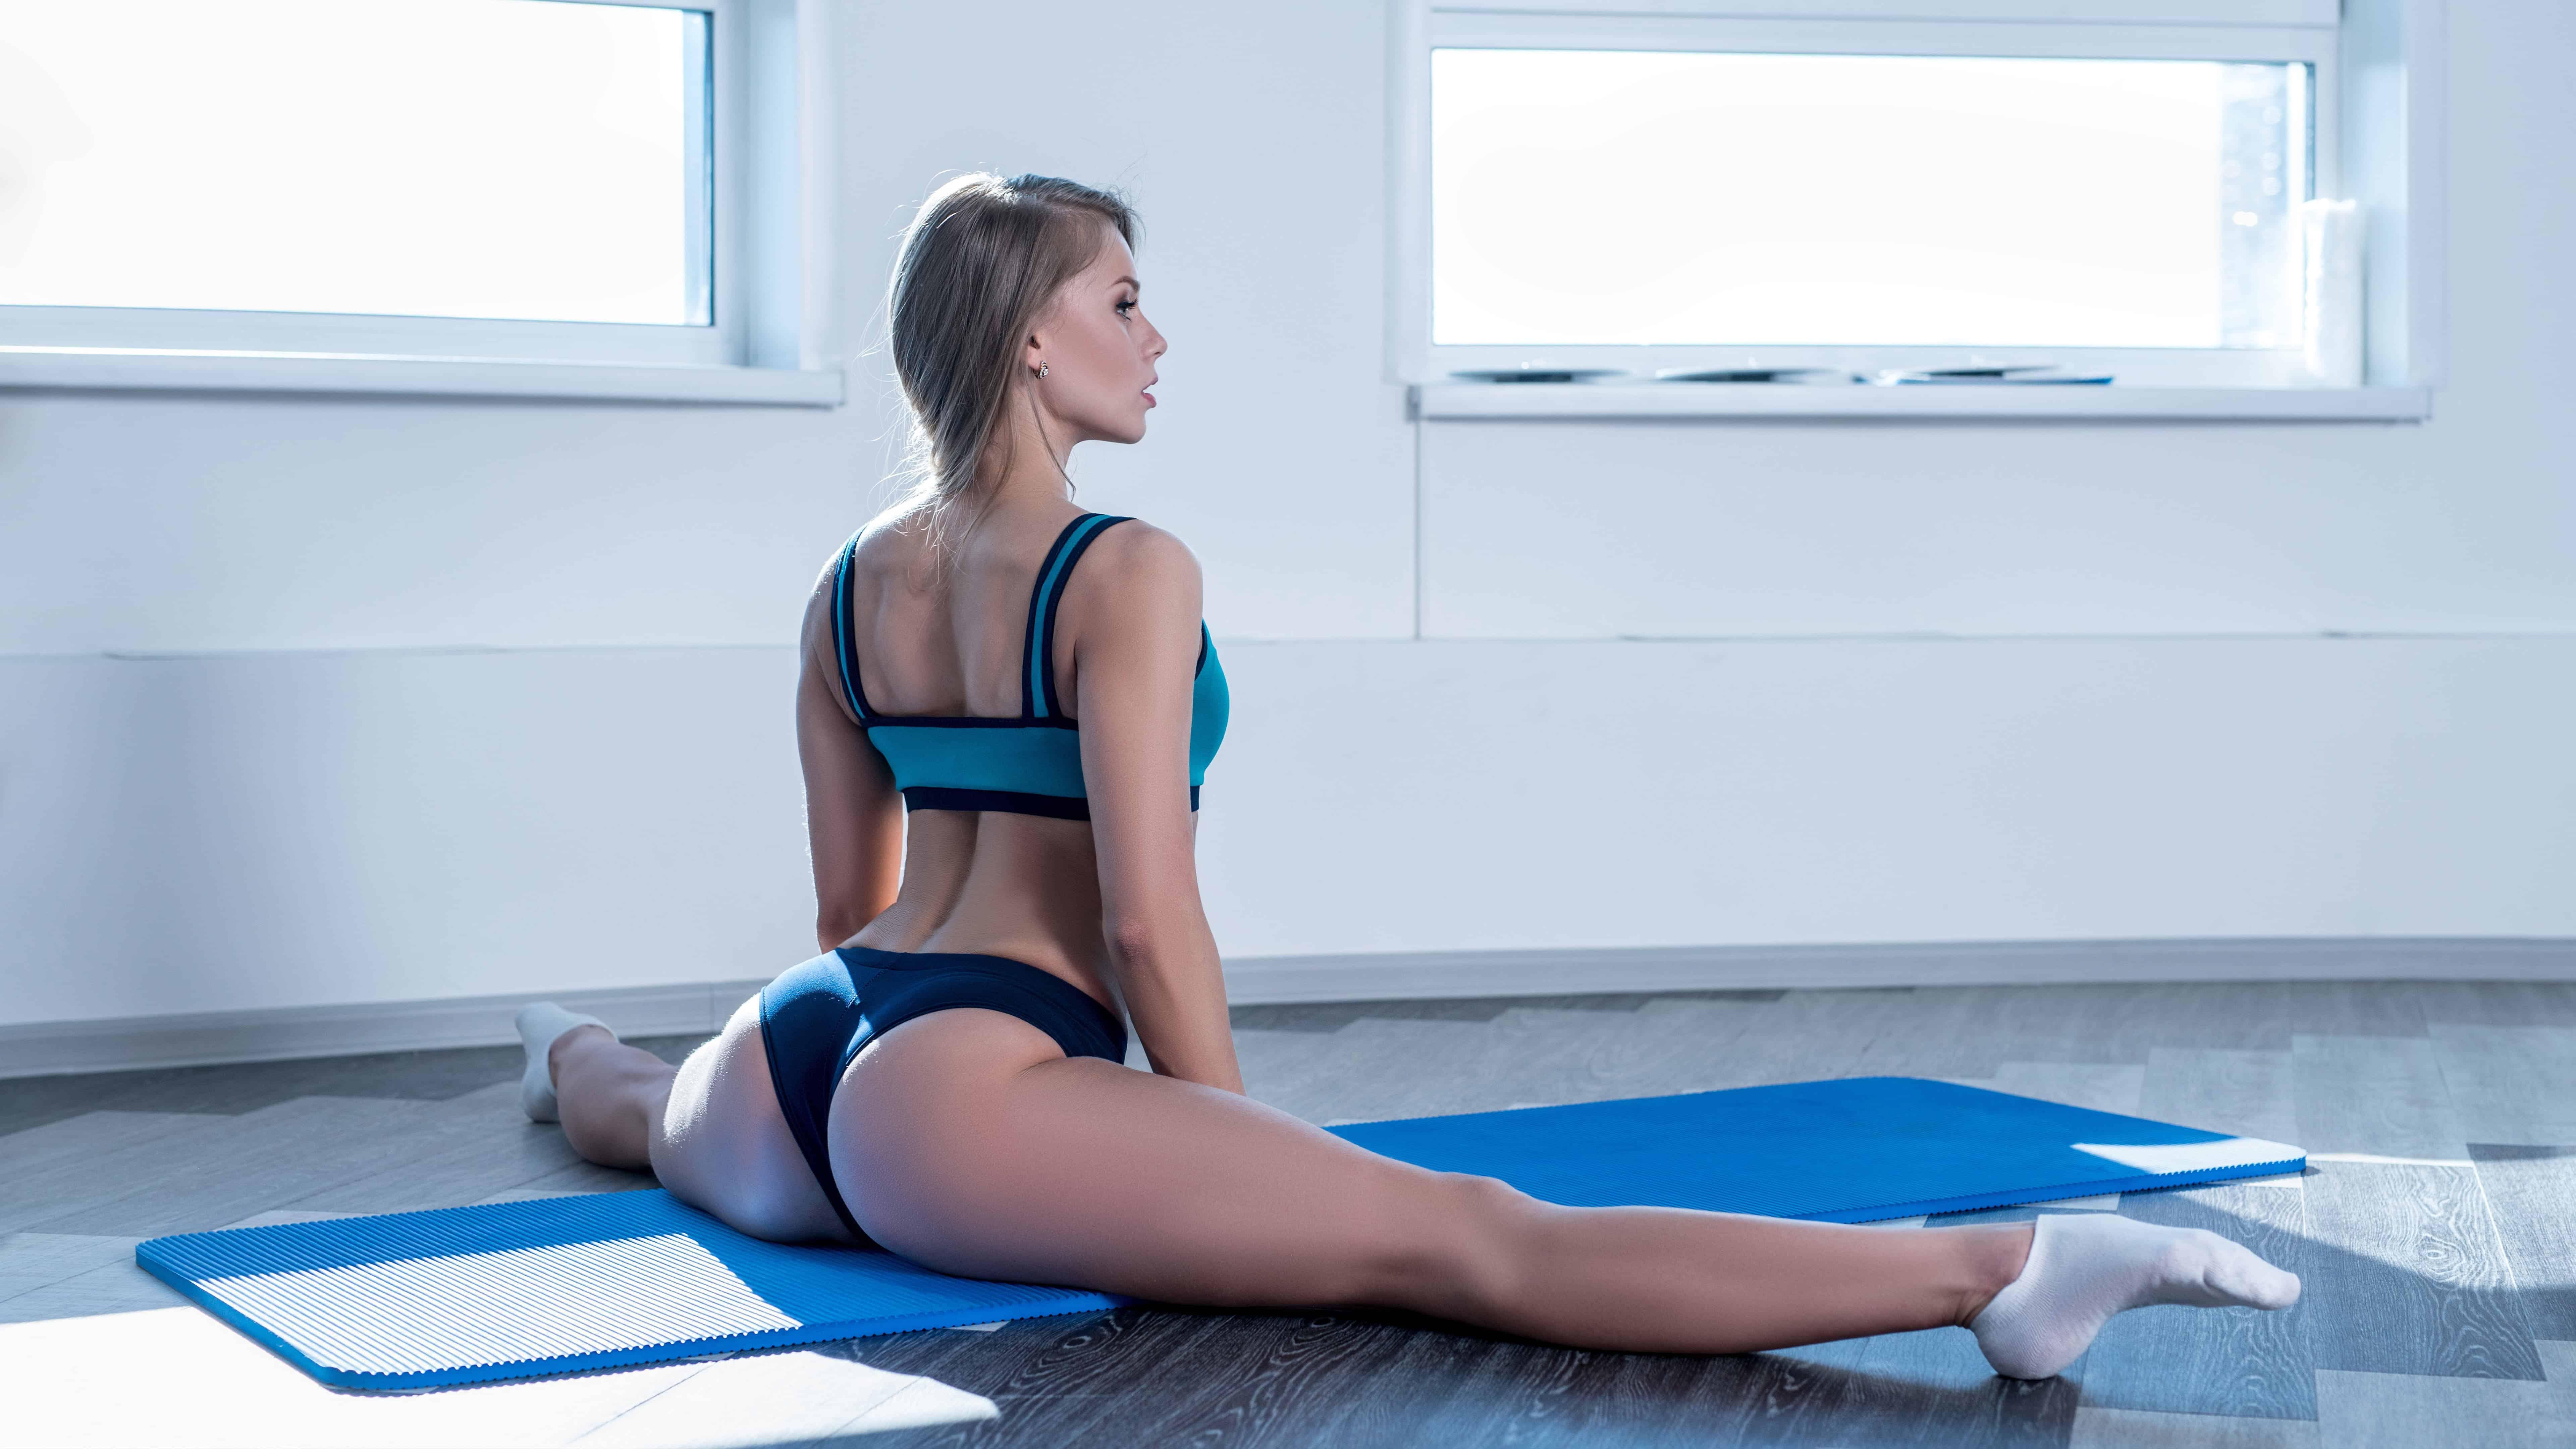 yoga leg split uhd 8k wallpaper